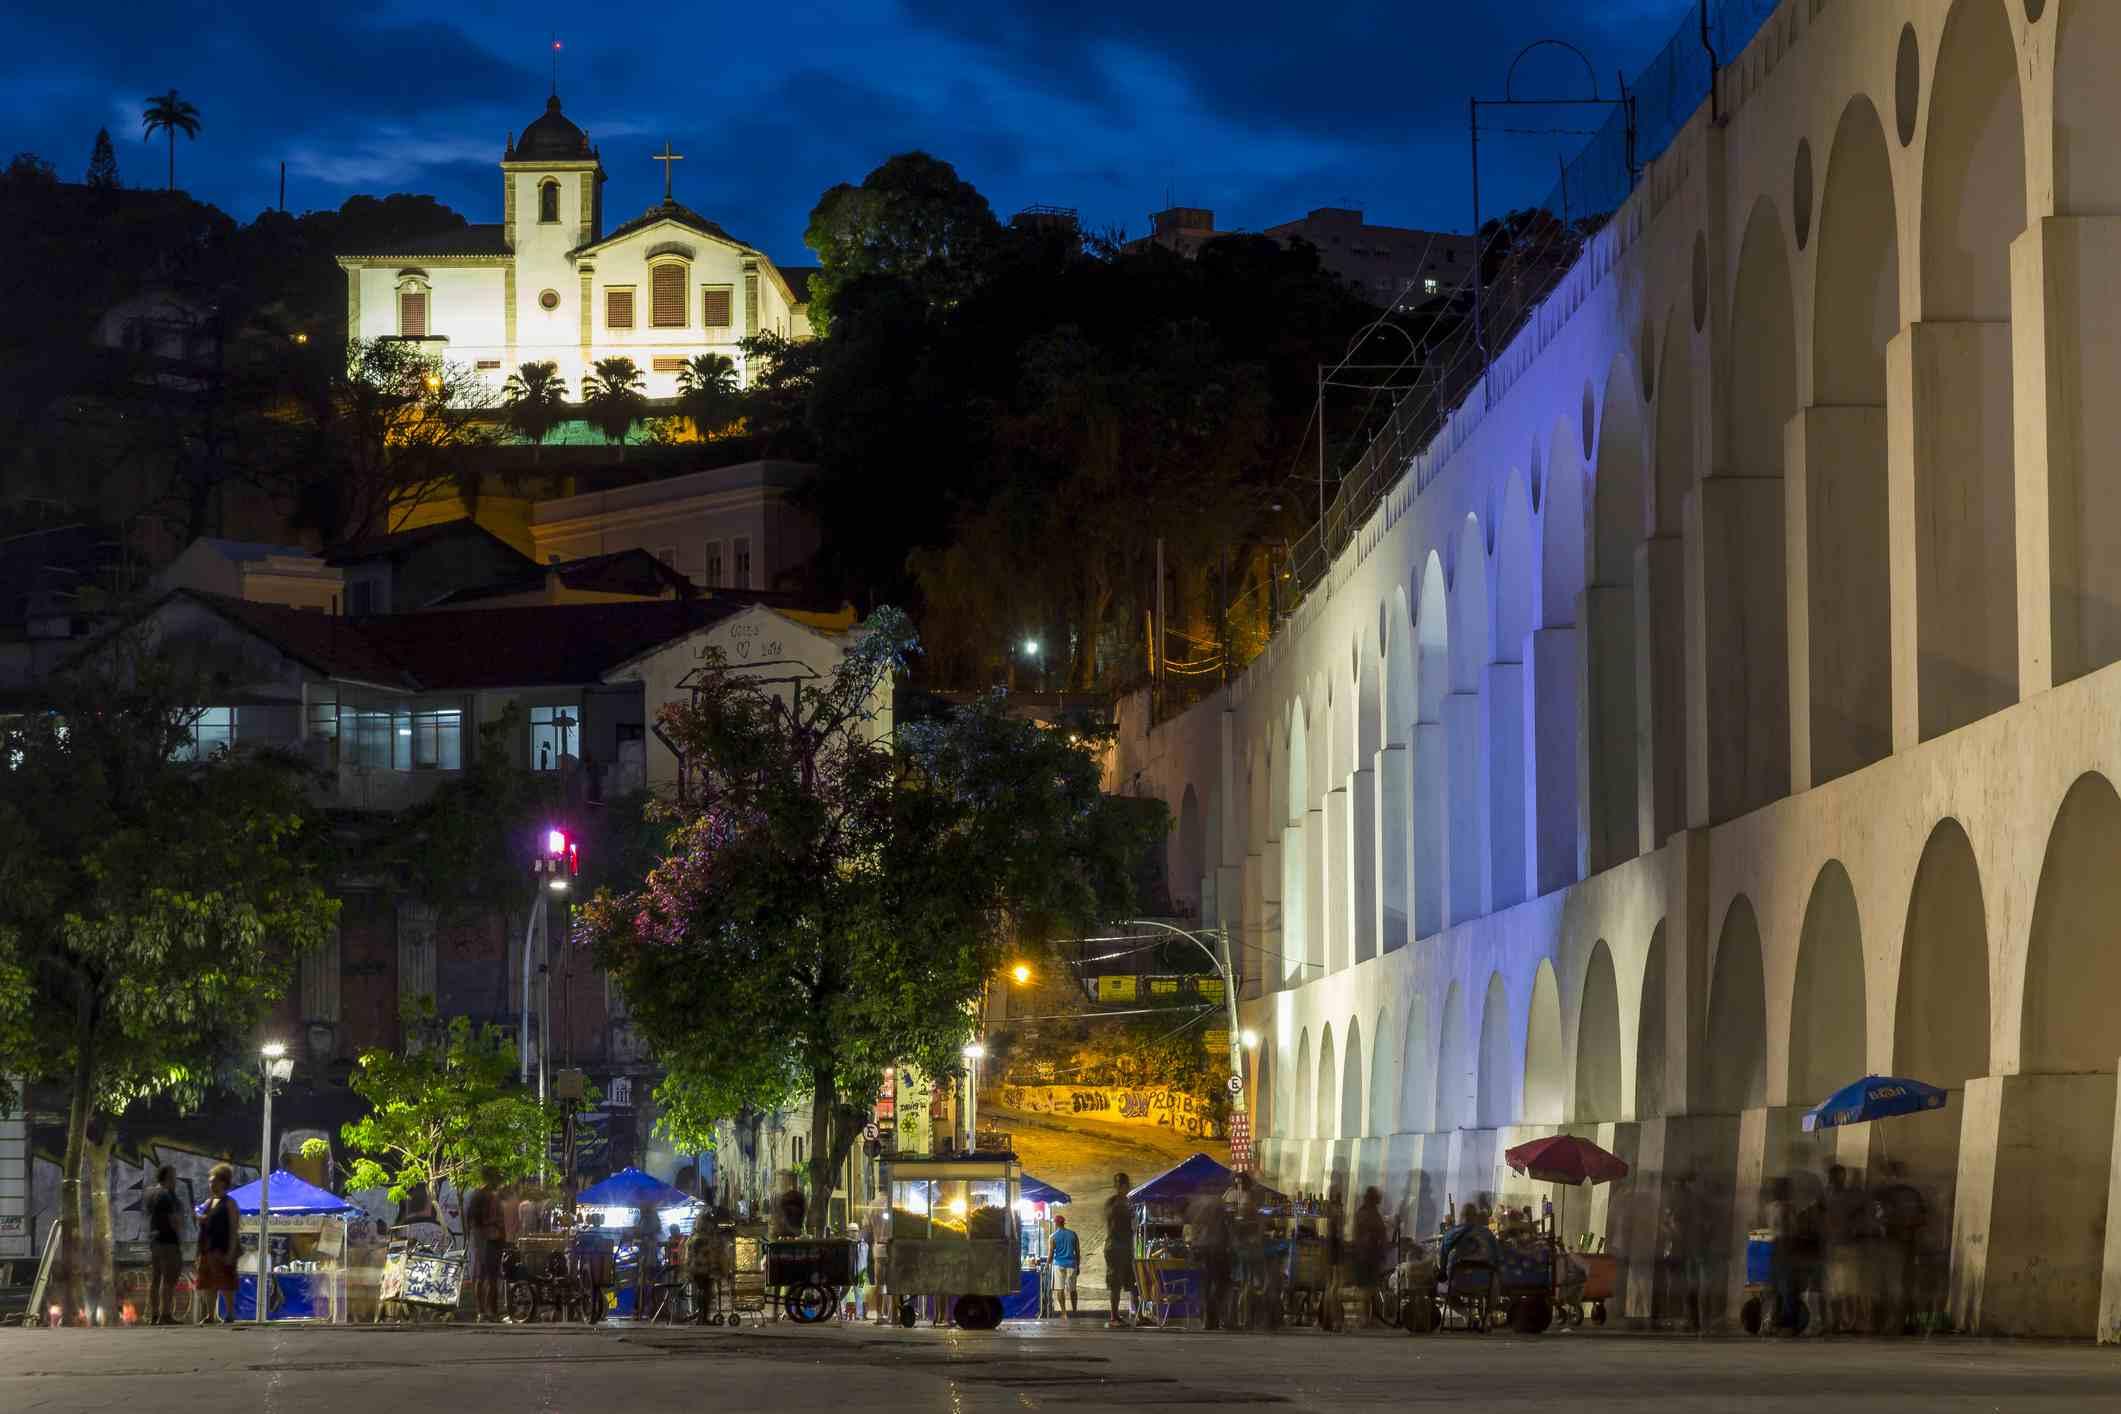 Night shot of the Lapa Arches and the Santa Teresa convent, Rio de Janeiro